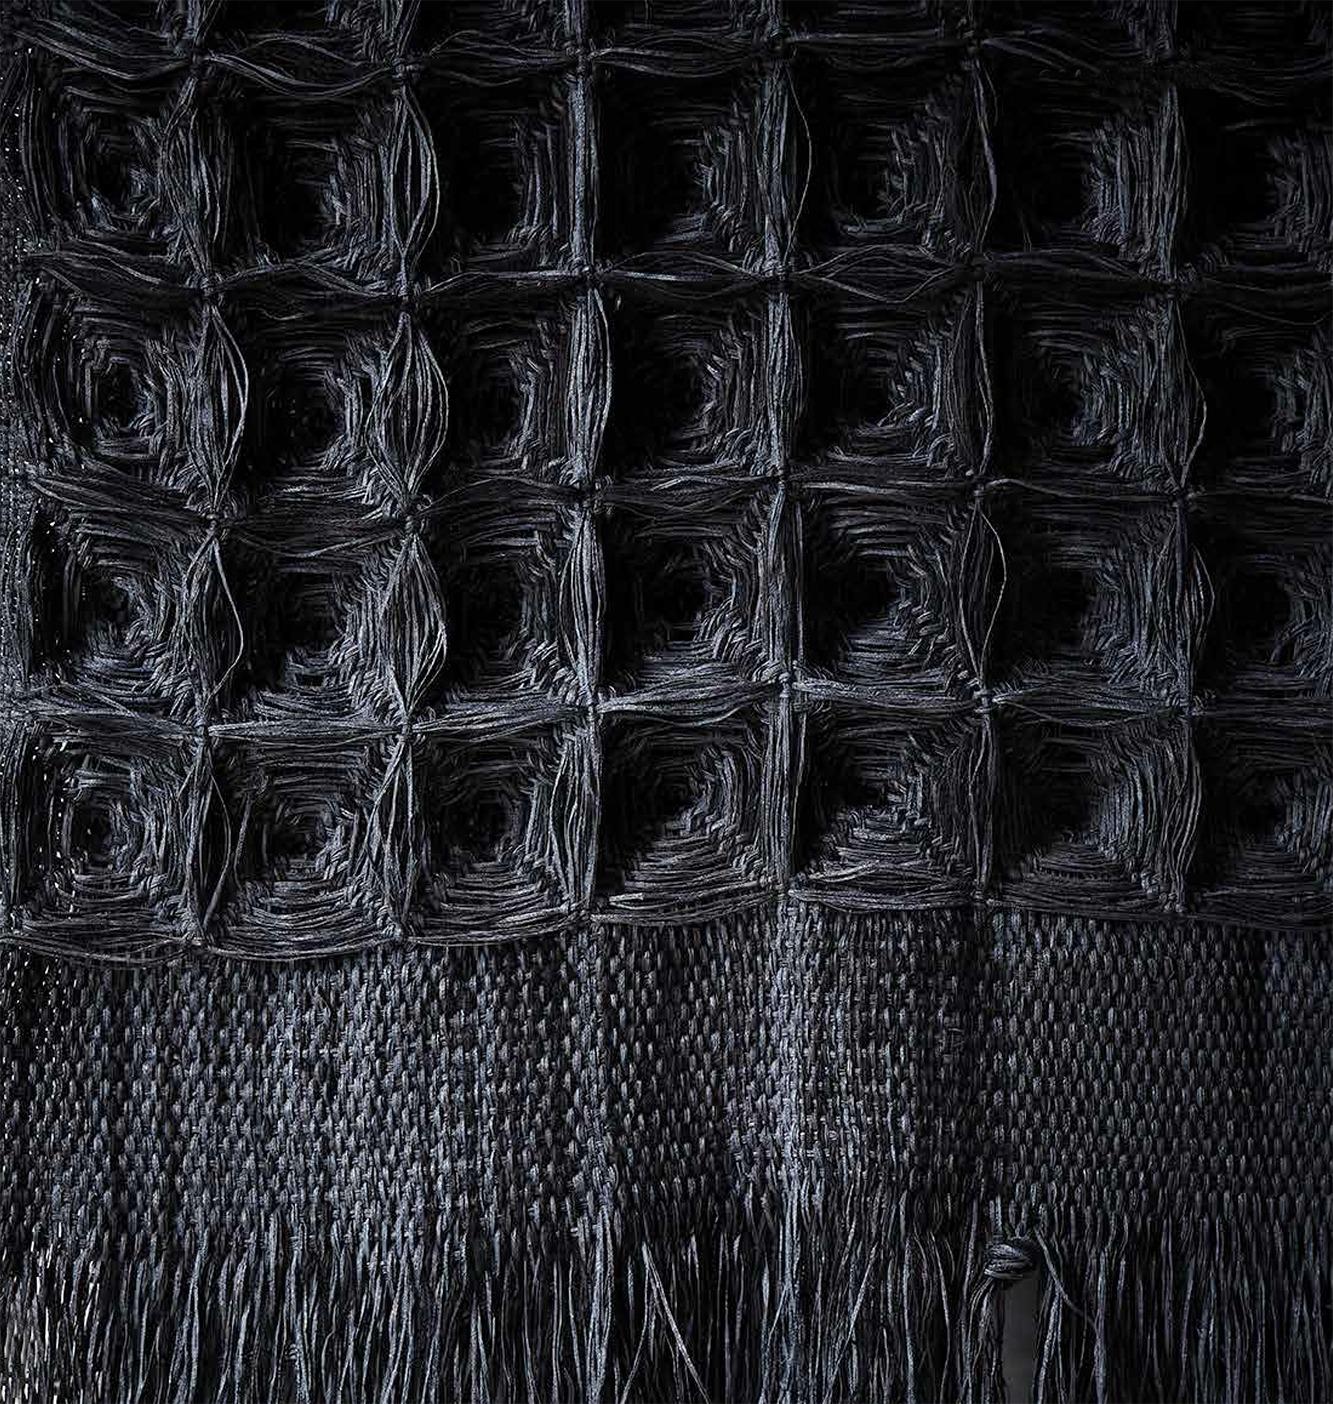 Giant Charcoal, Hiroko Takeda, 2014, NY Studio, 80%22h x 36%22w, mixed natural fibers (detail).jpg